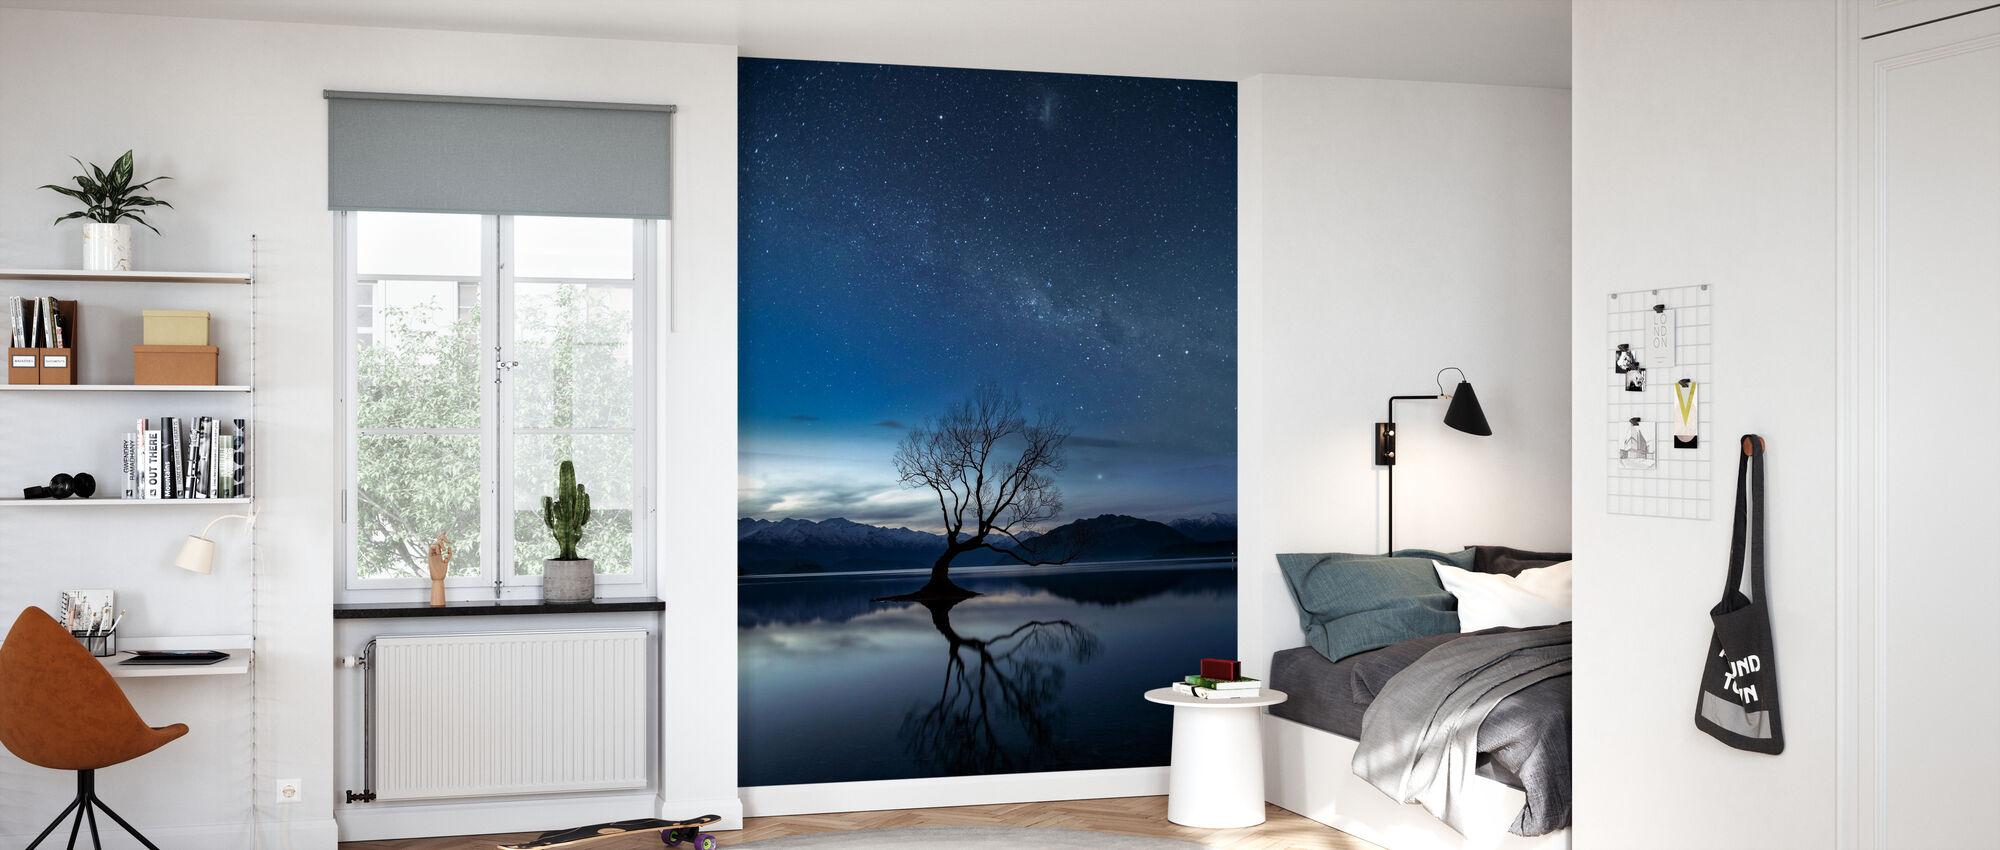 Wanaka Tree - Wallpaper - Kids Room